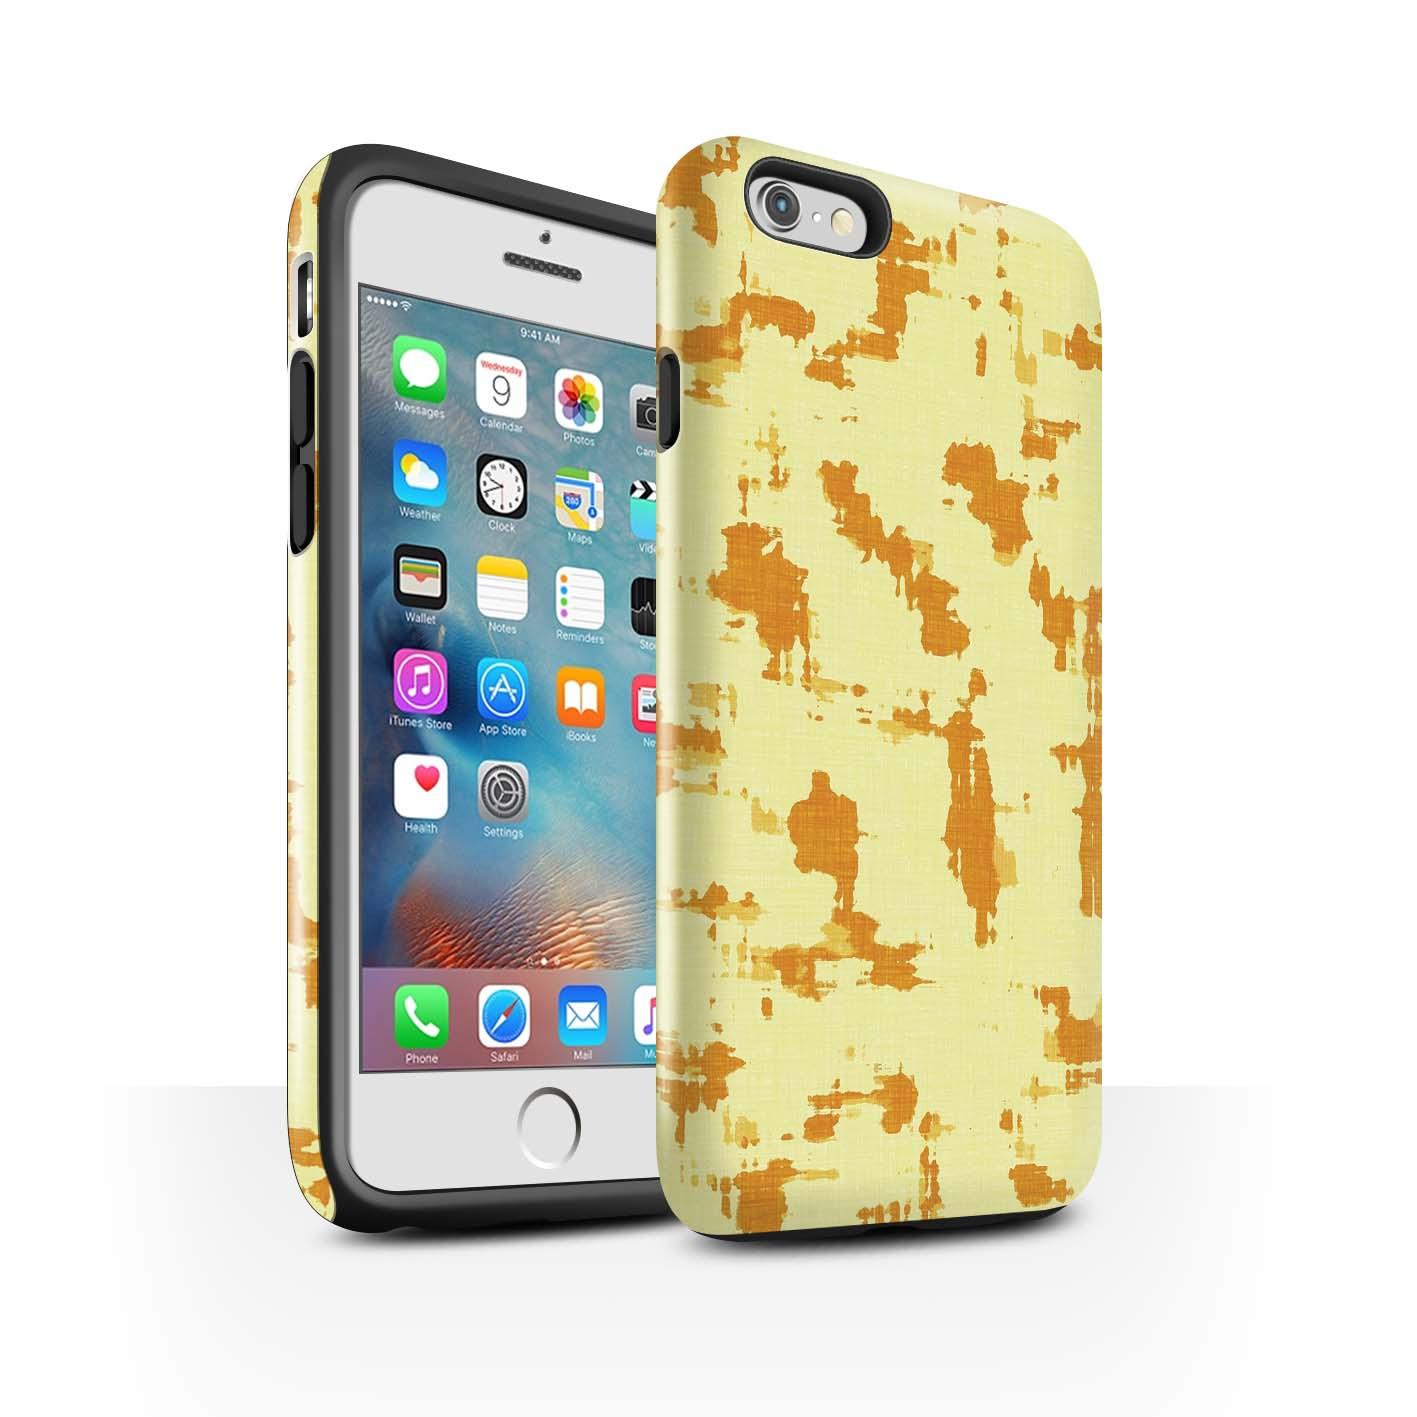 STUFF4-Gloss-Tough-Phone-Case-for-Apple-iPhone-6-Plus-5-5-Yellow-Fashion